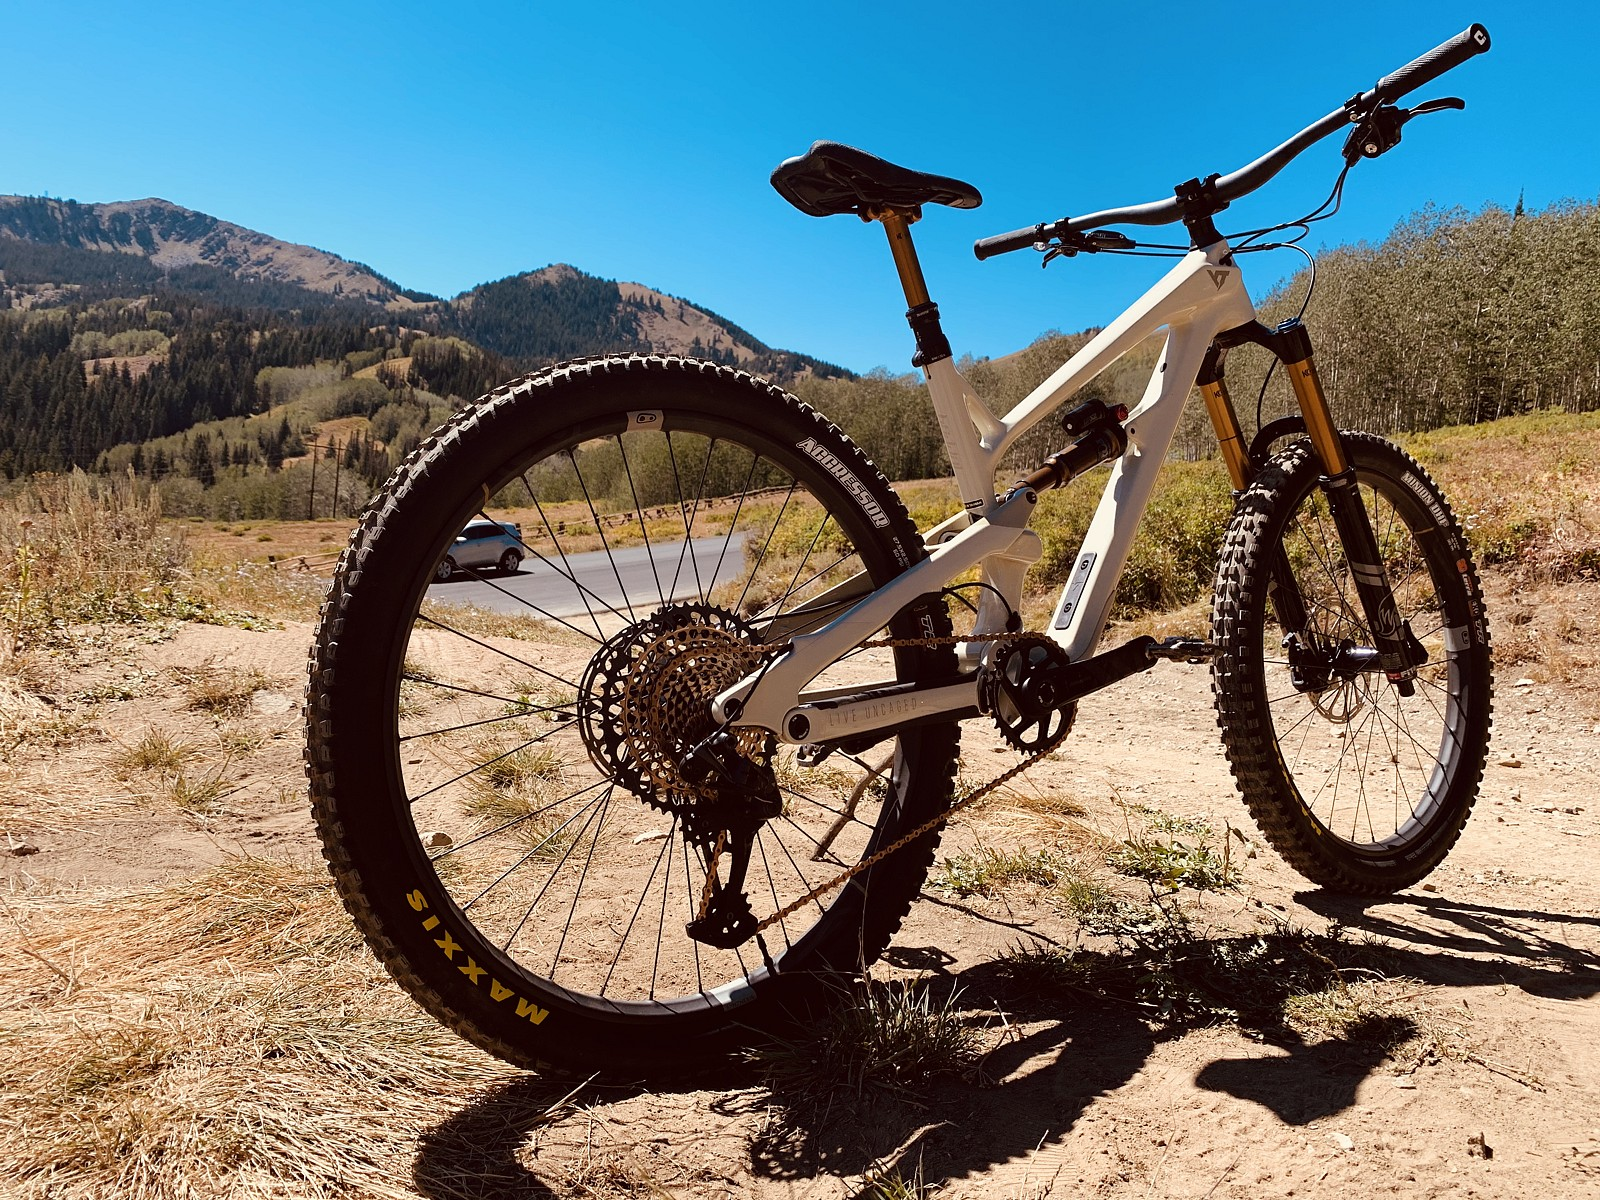 IMG E0216 - jaykalafatis - Mountain Biking Pictures - Vital MTB